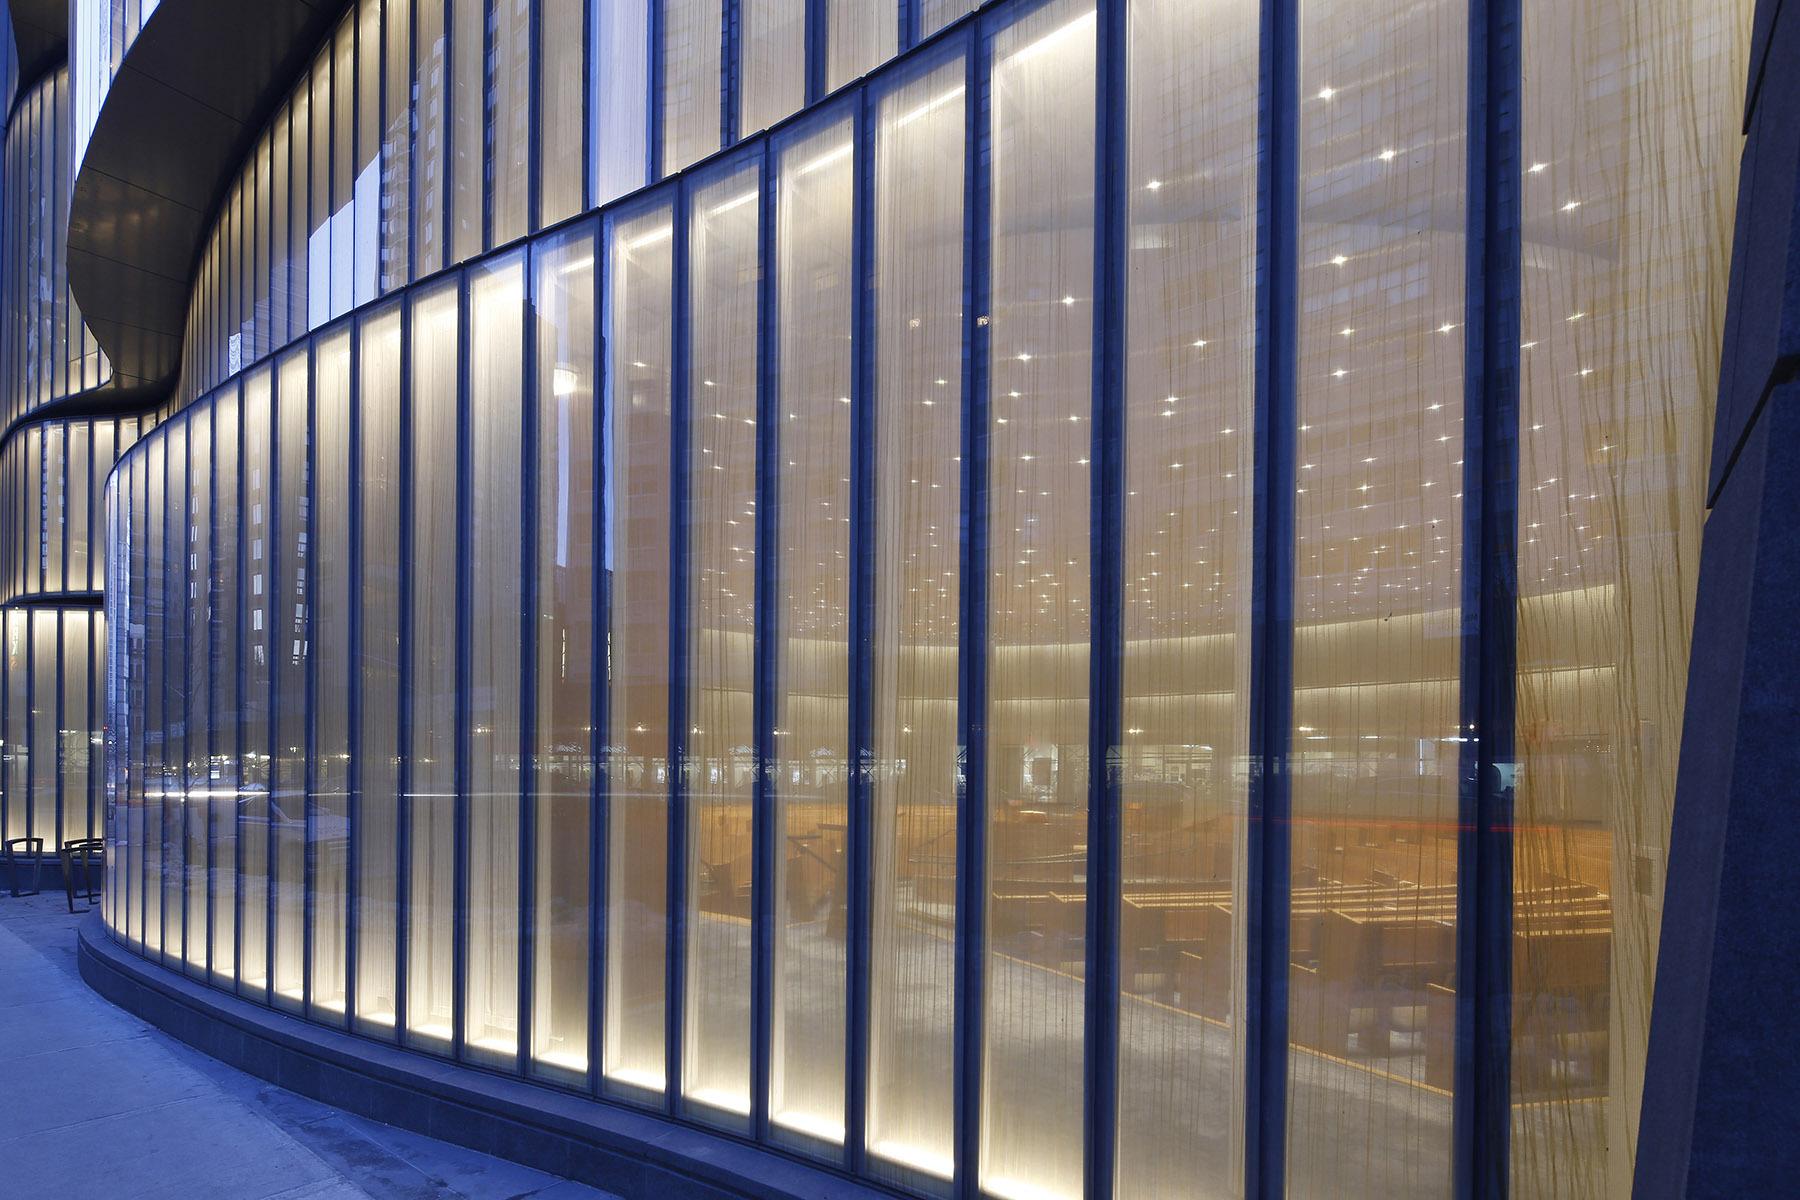 Synagogue Lincoln square, New York, US - Architecte : Cetra Ruddy - Conception lumière : Tillotson Design Associates © Emile Dubuisson, Studio Dubuisson